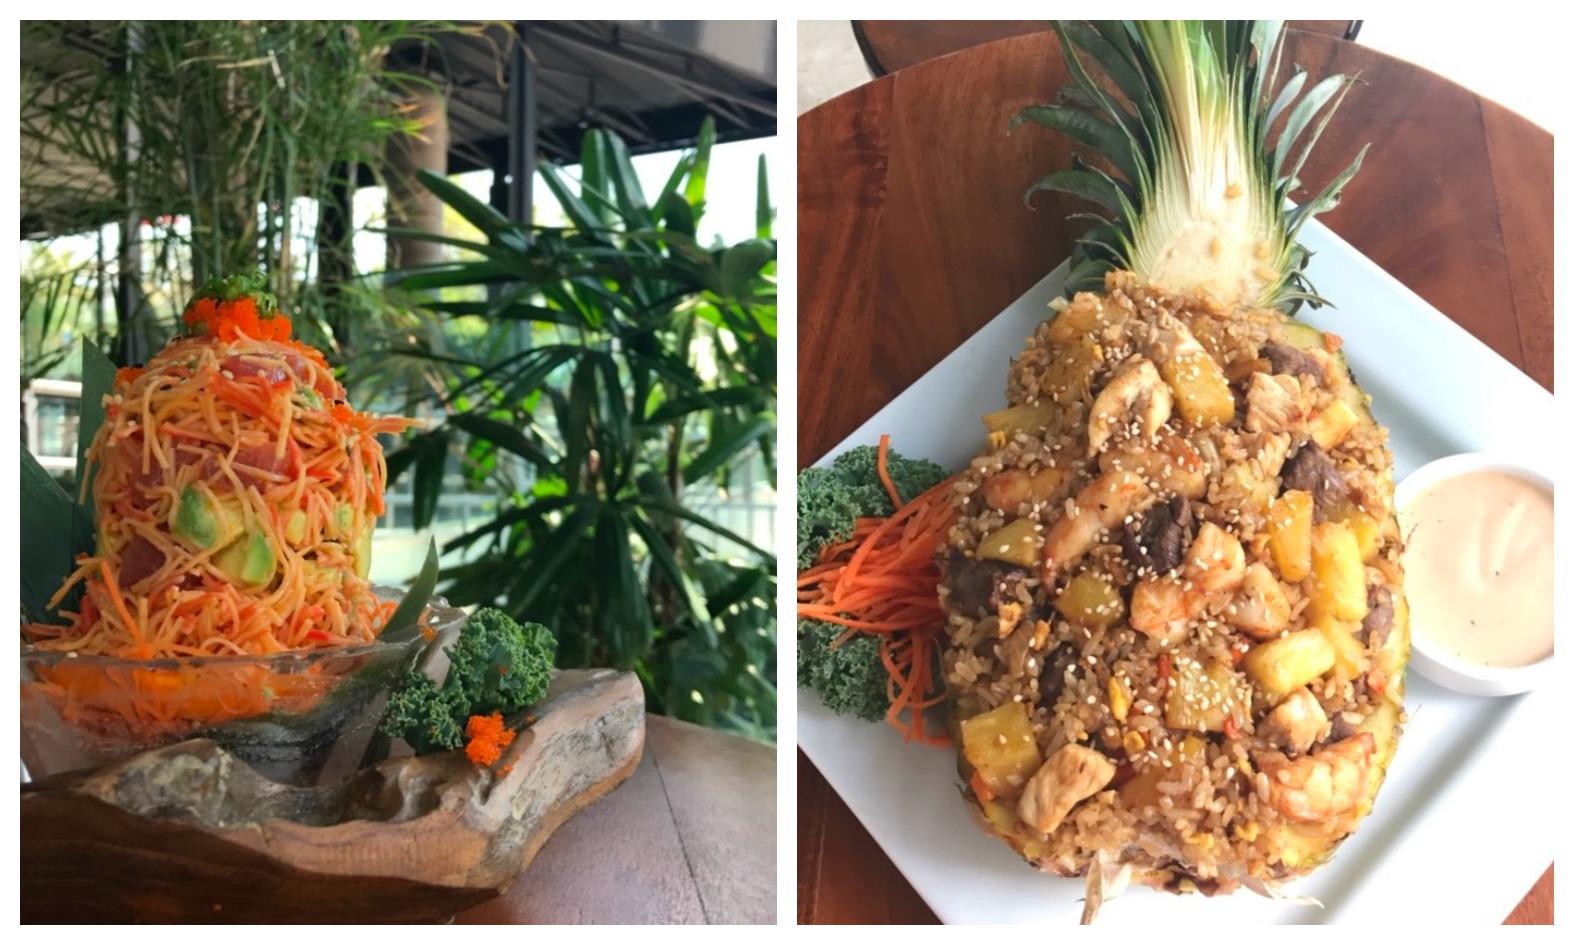 Sushi Sake Noodles and Pineapple rice